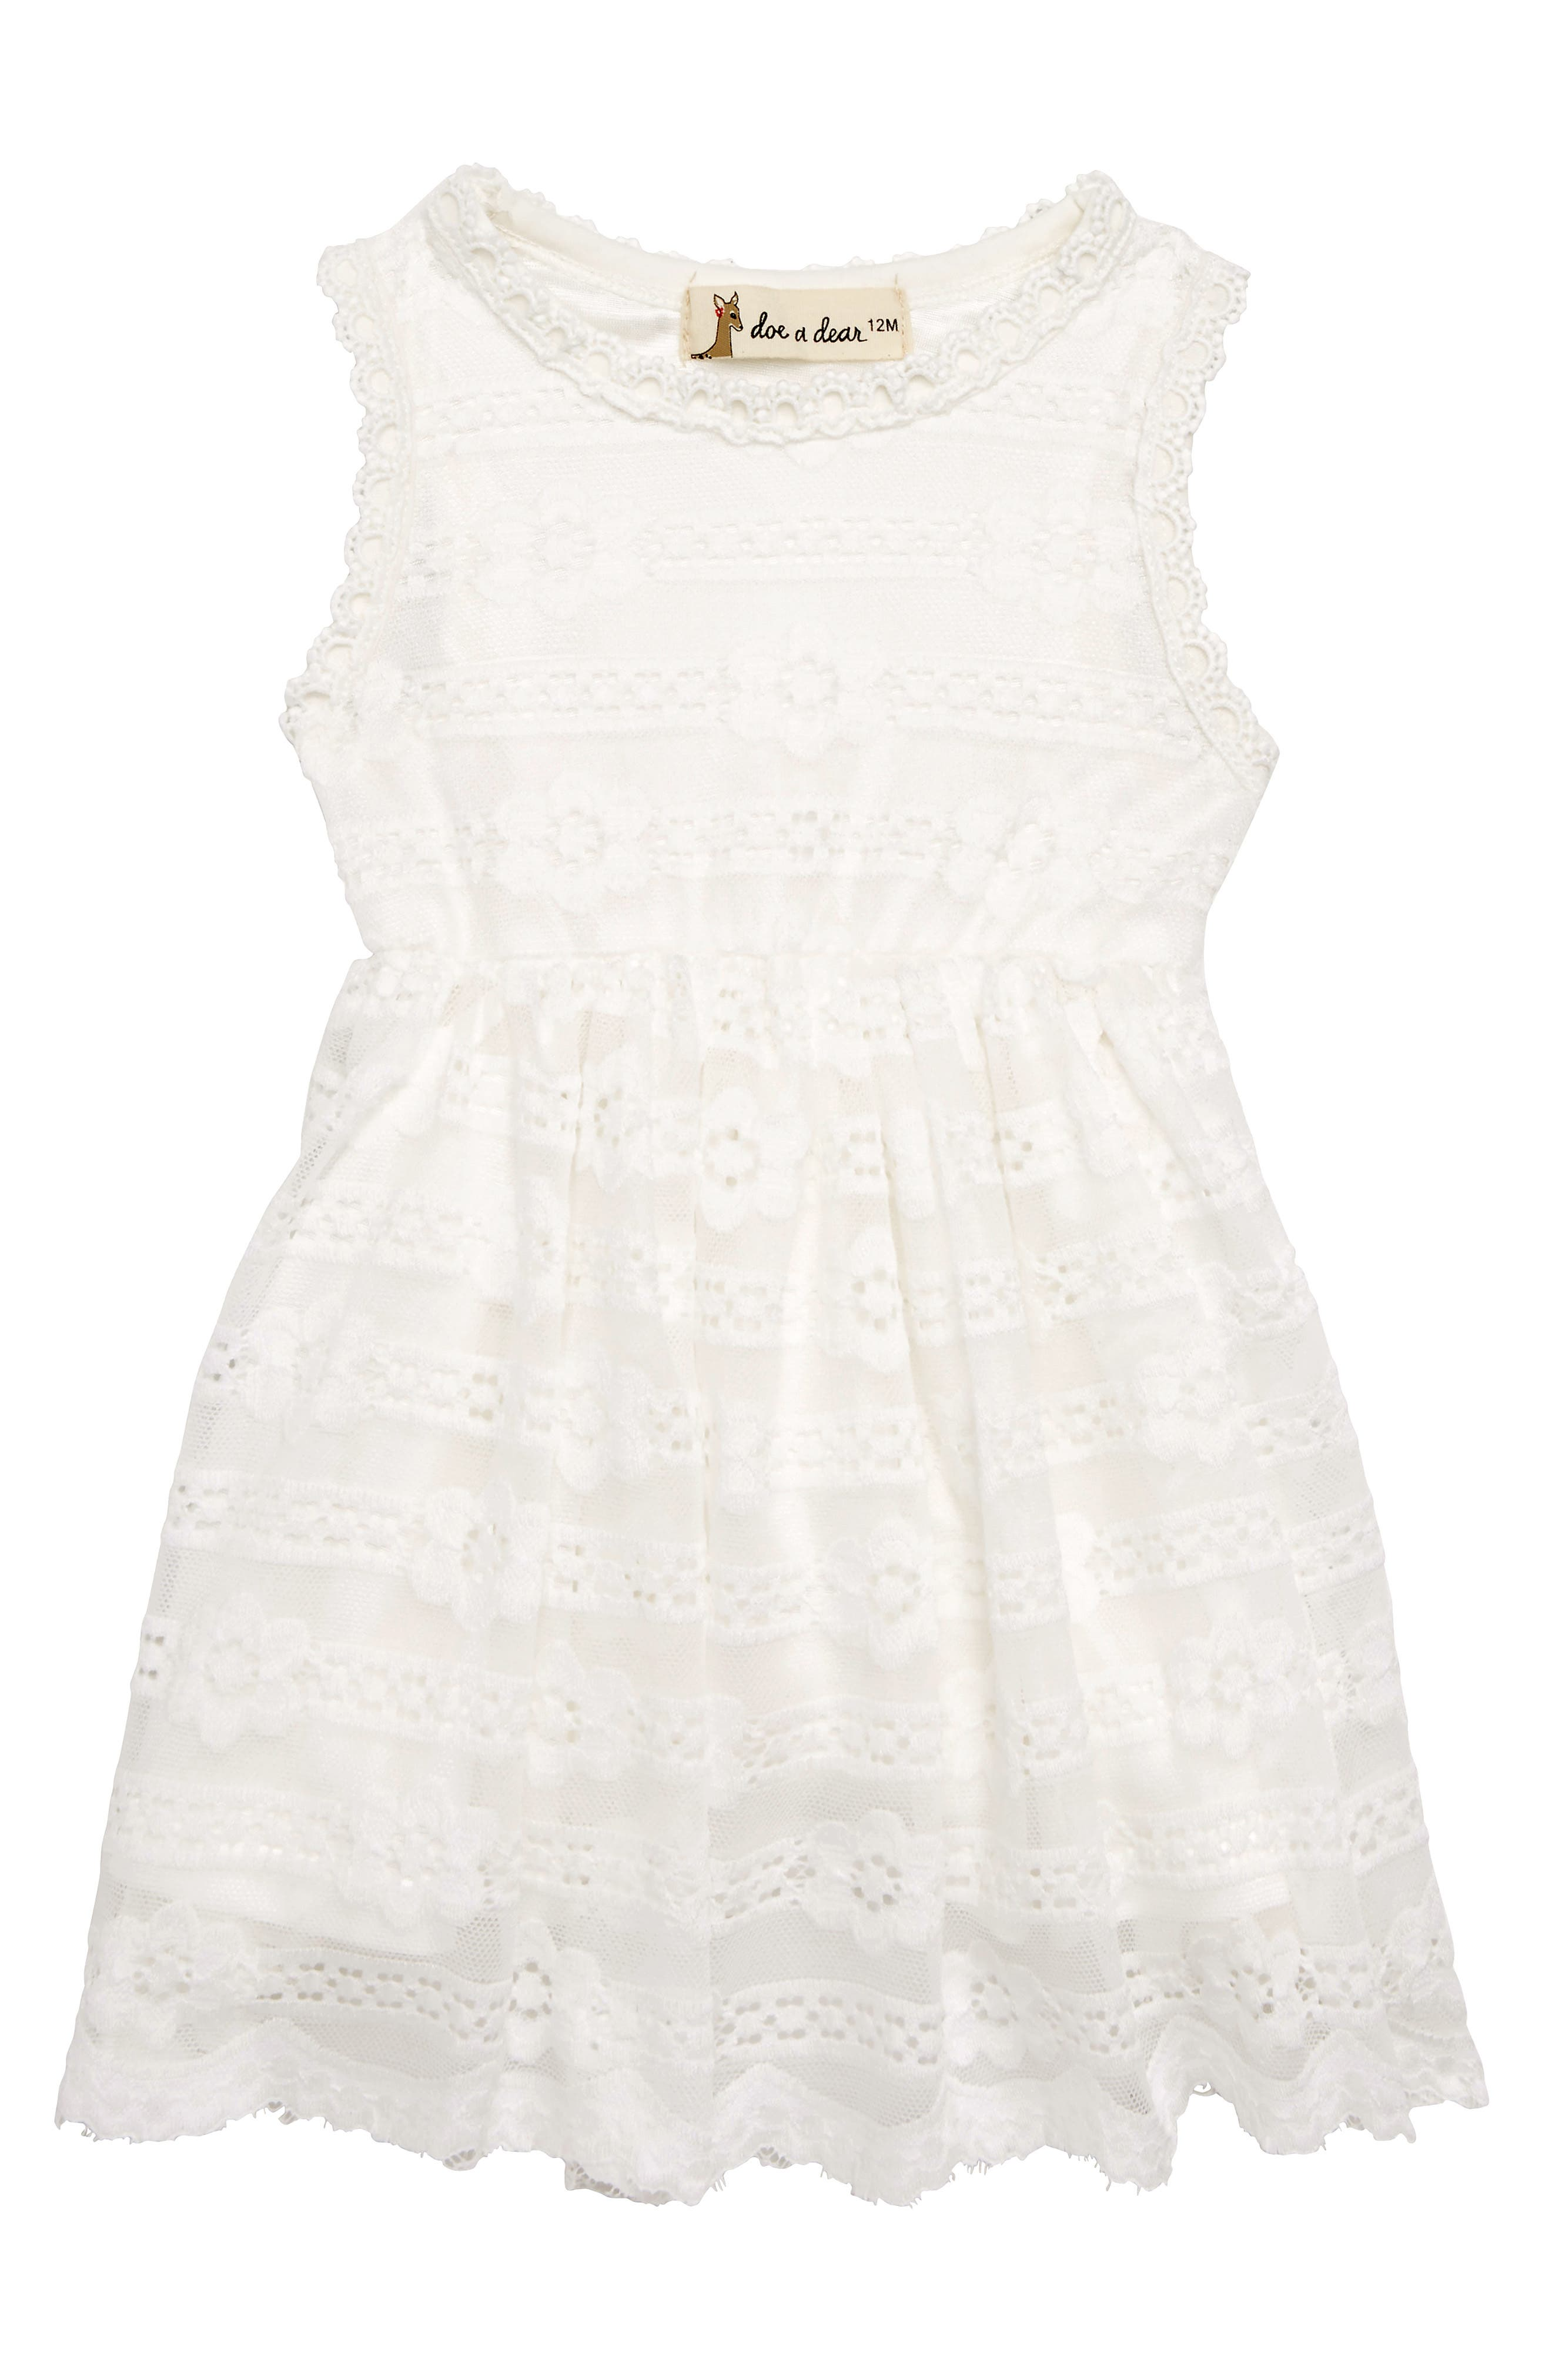 Alternate Image 1 Selected - Doe a Dear Princess Cut Party Dress (Baby Girls)